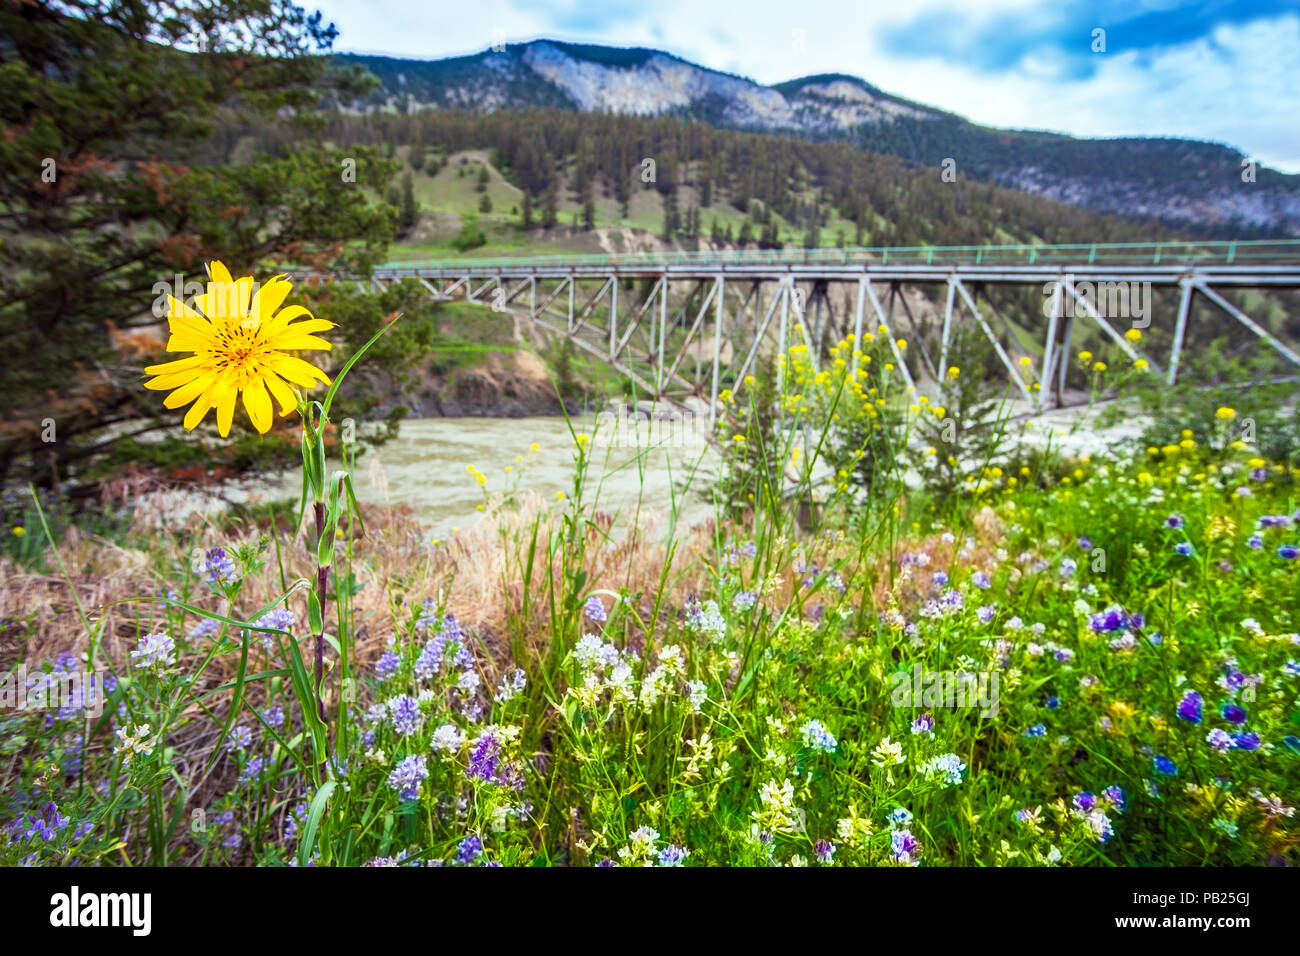 Bridge over the Fraser River at Williams Lake British Columbia Canada - Stock Image